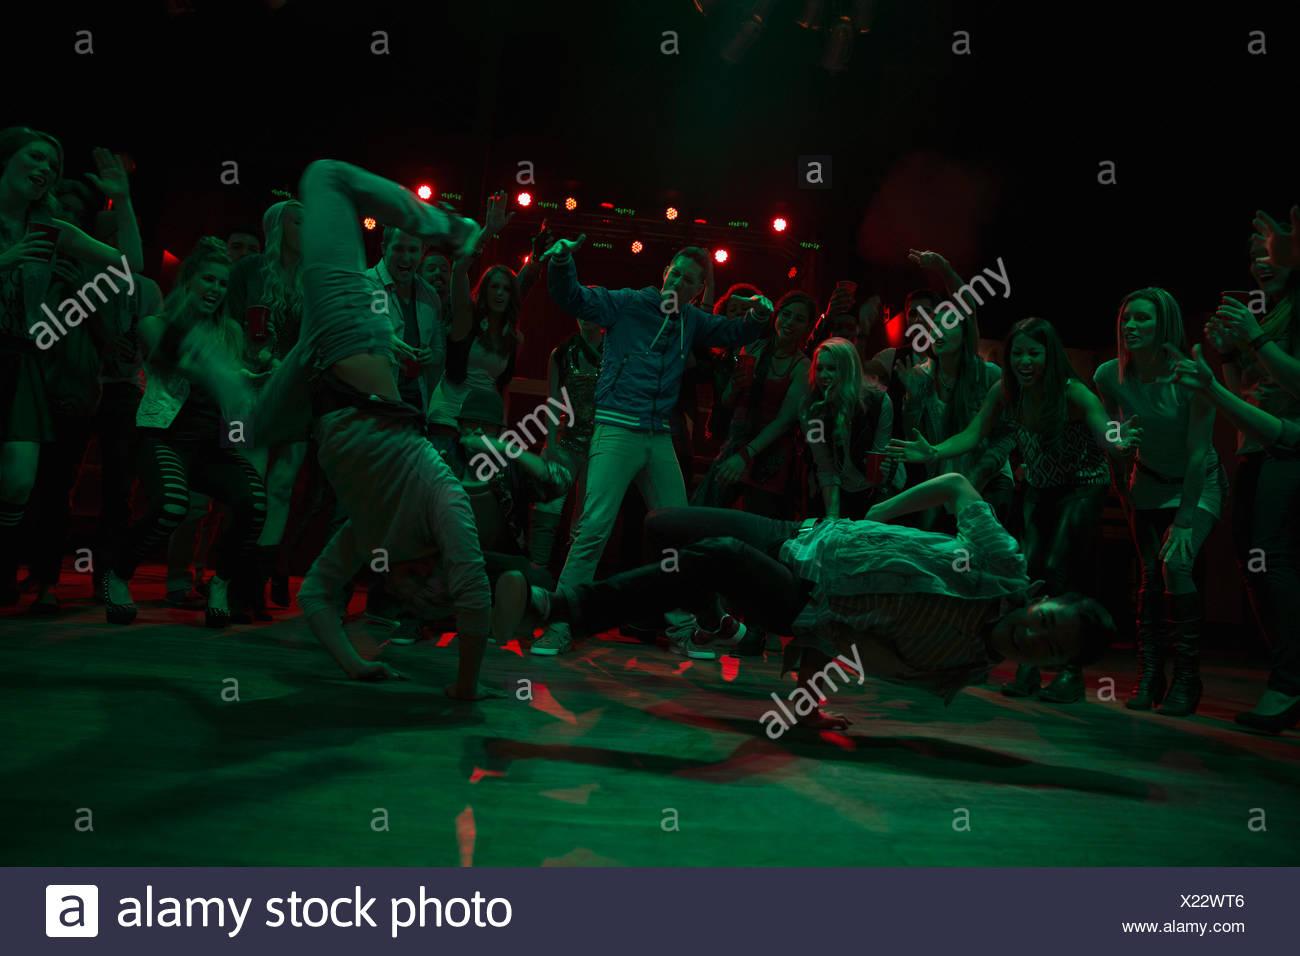 Crowd watching and cheering break dancers - Stock Image